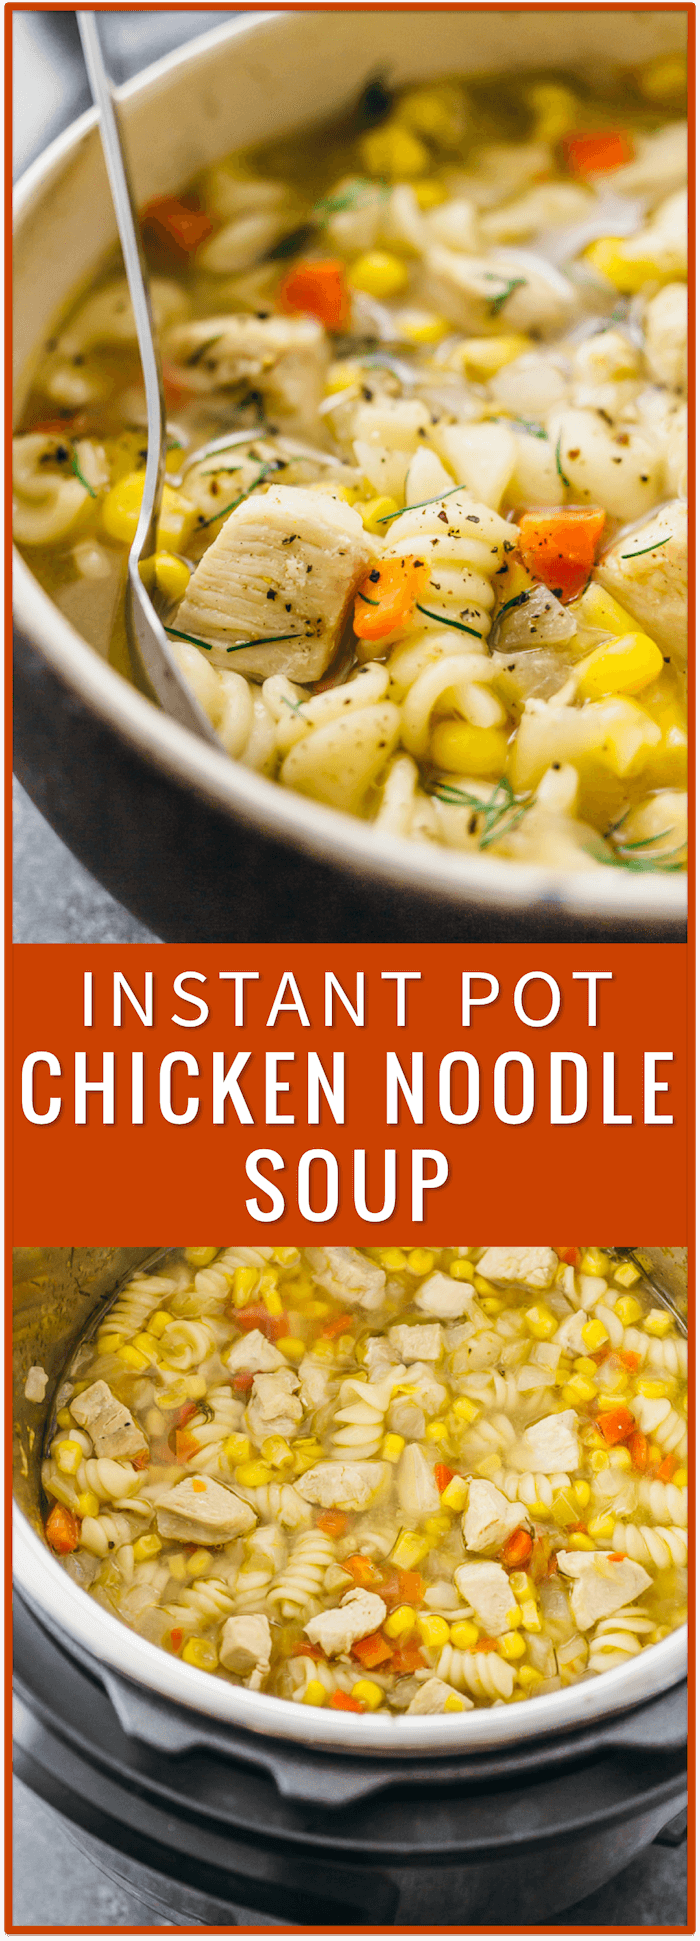 Instant pot chicken noodle soup, homemade, easy, from scratch, pressure cooker, healthy, recipe, fast, best, crock pot, pioneer woman, slow cooker, paula deen, campbells, tortellini, creamy, rotisserie